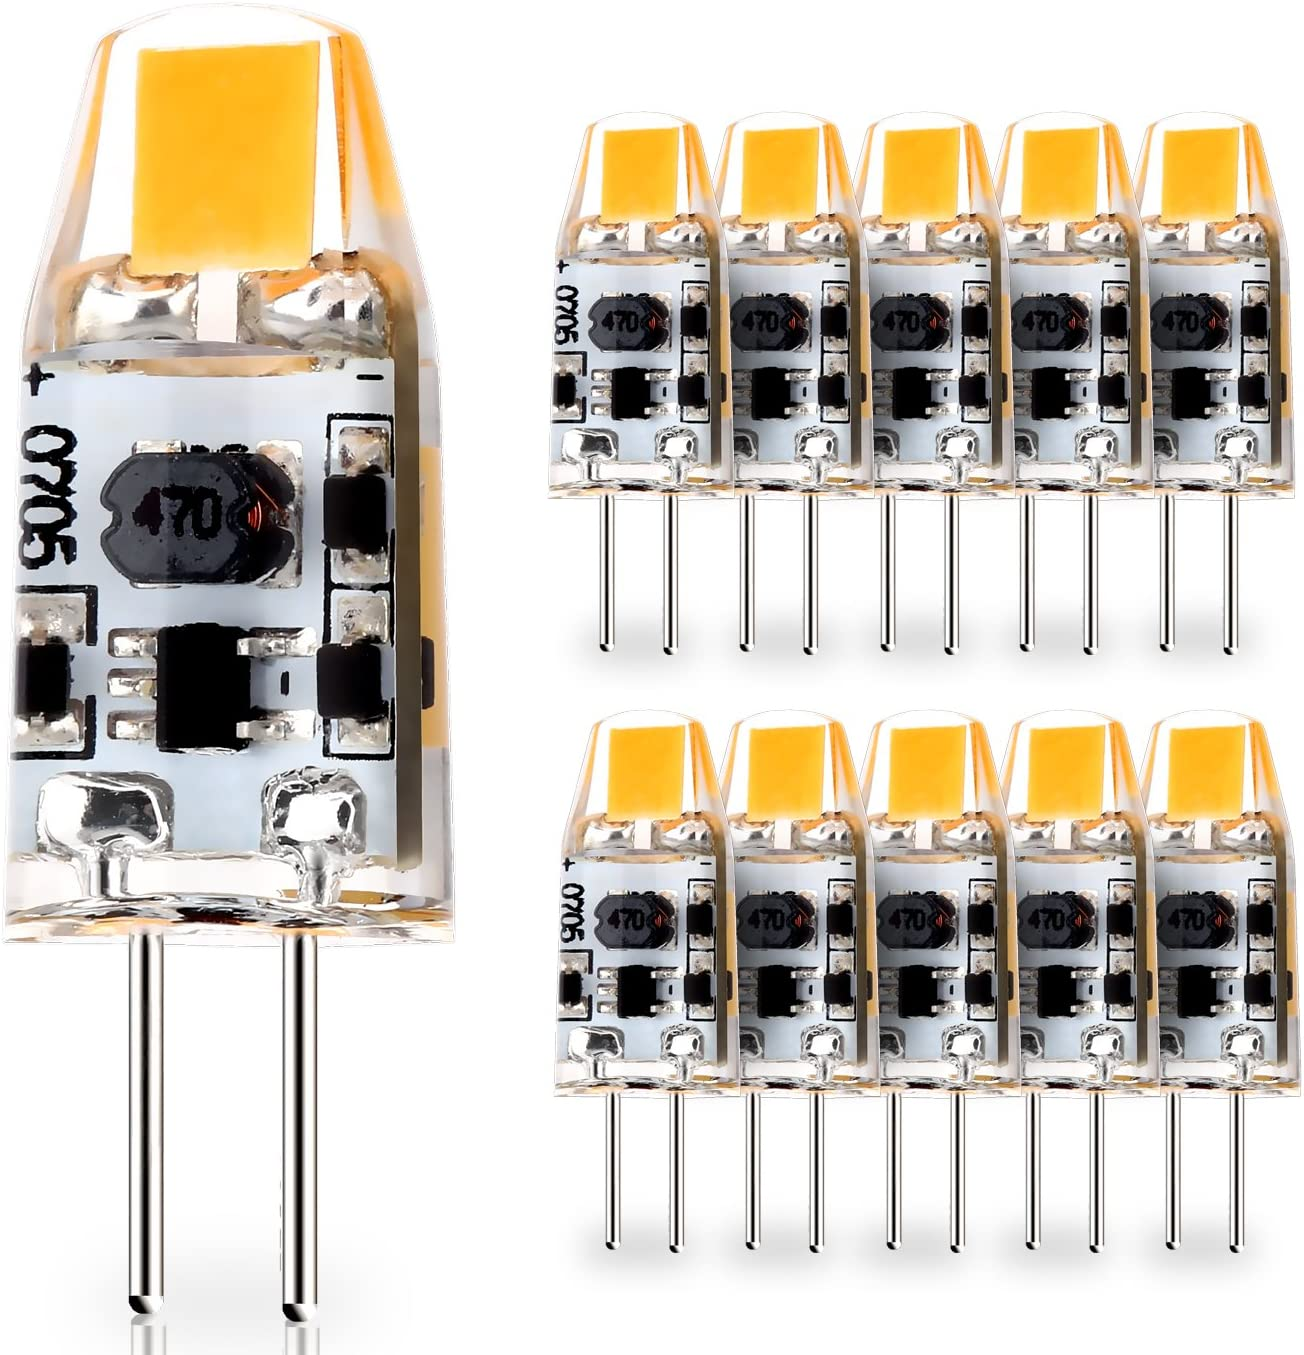 JAUHOFOGEI 10x 1W Mini Bombilla lámpara LED COB G4, 12-24V AC DC, Equivalente a 10W Halógena, 120lm, Blanco cálido 2800K, Ra83, Non-Regulable